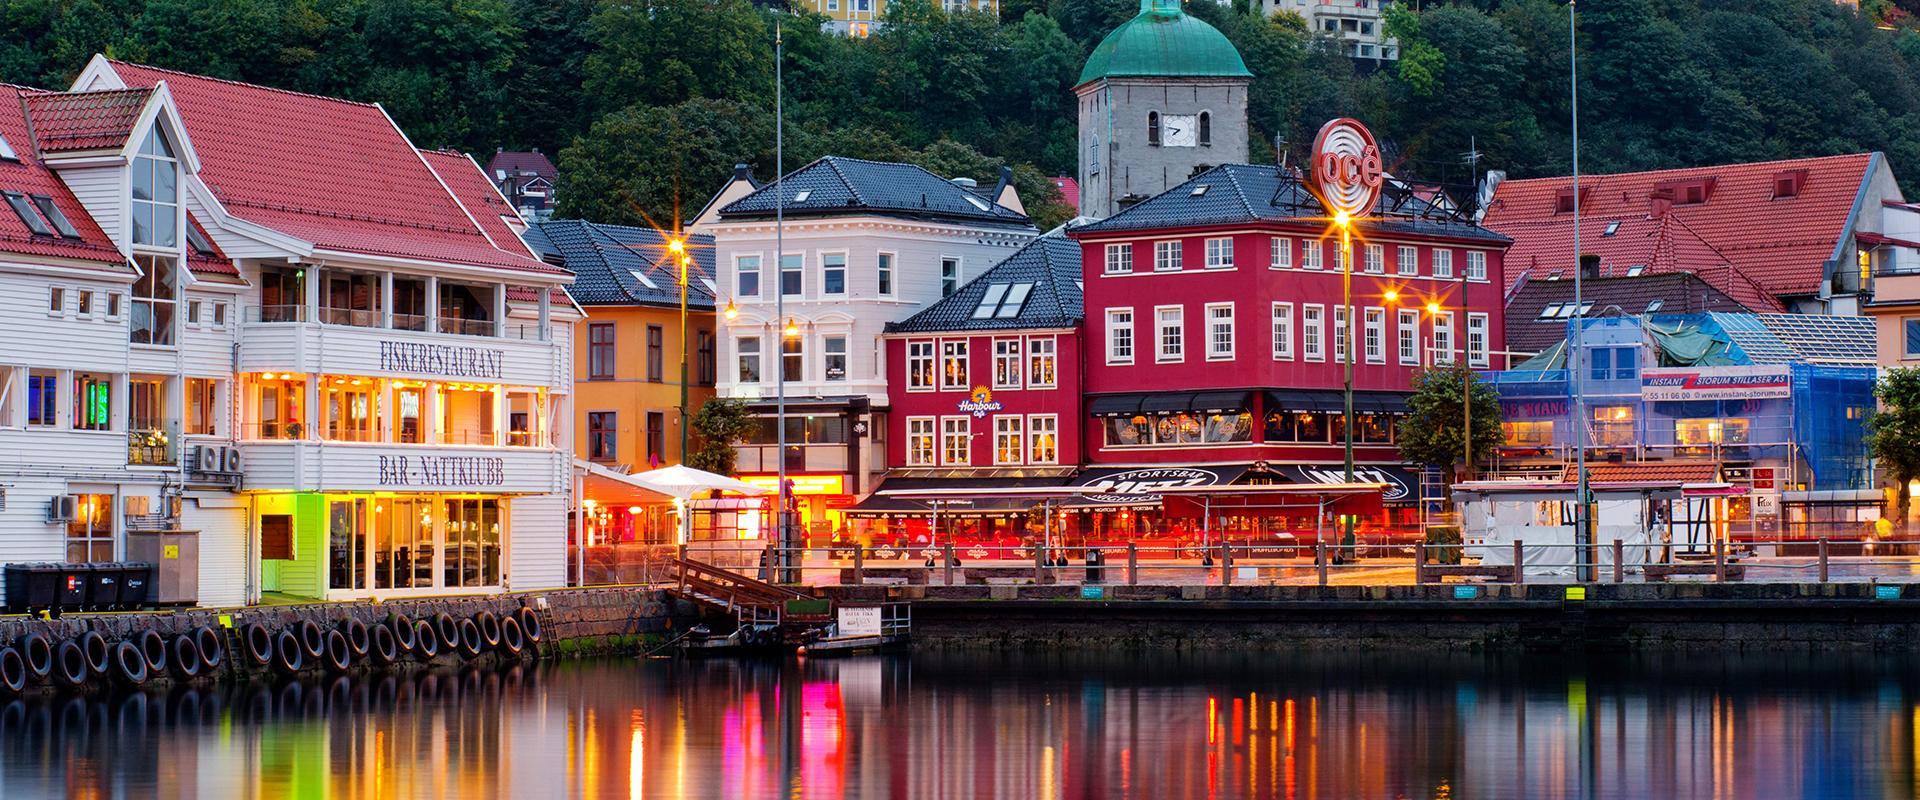 Bergen Images